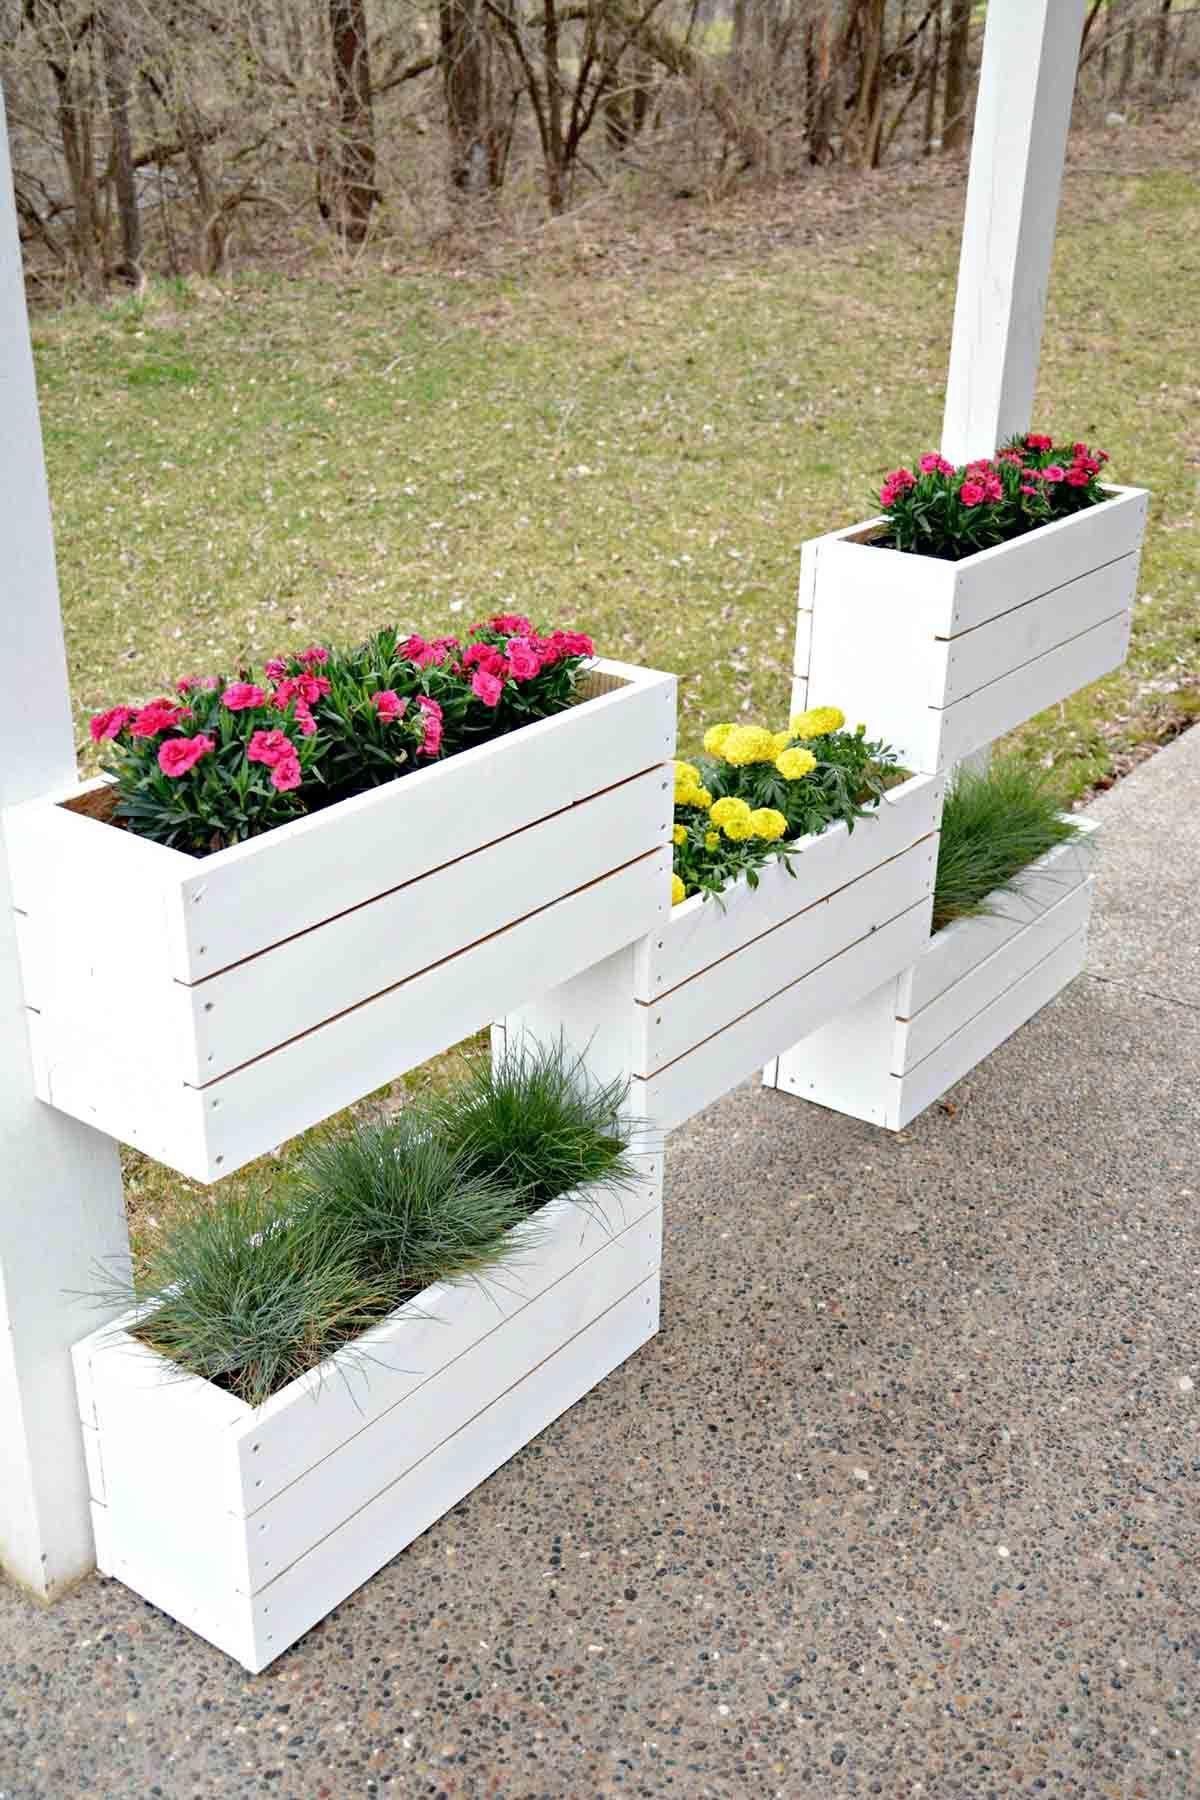 33 Beautiful Built In Planter Ideas To Upgrade Your Outdoor Space Diy Garden Garden Projects Vertical Planter